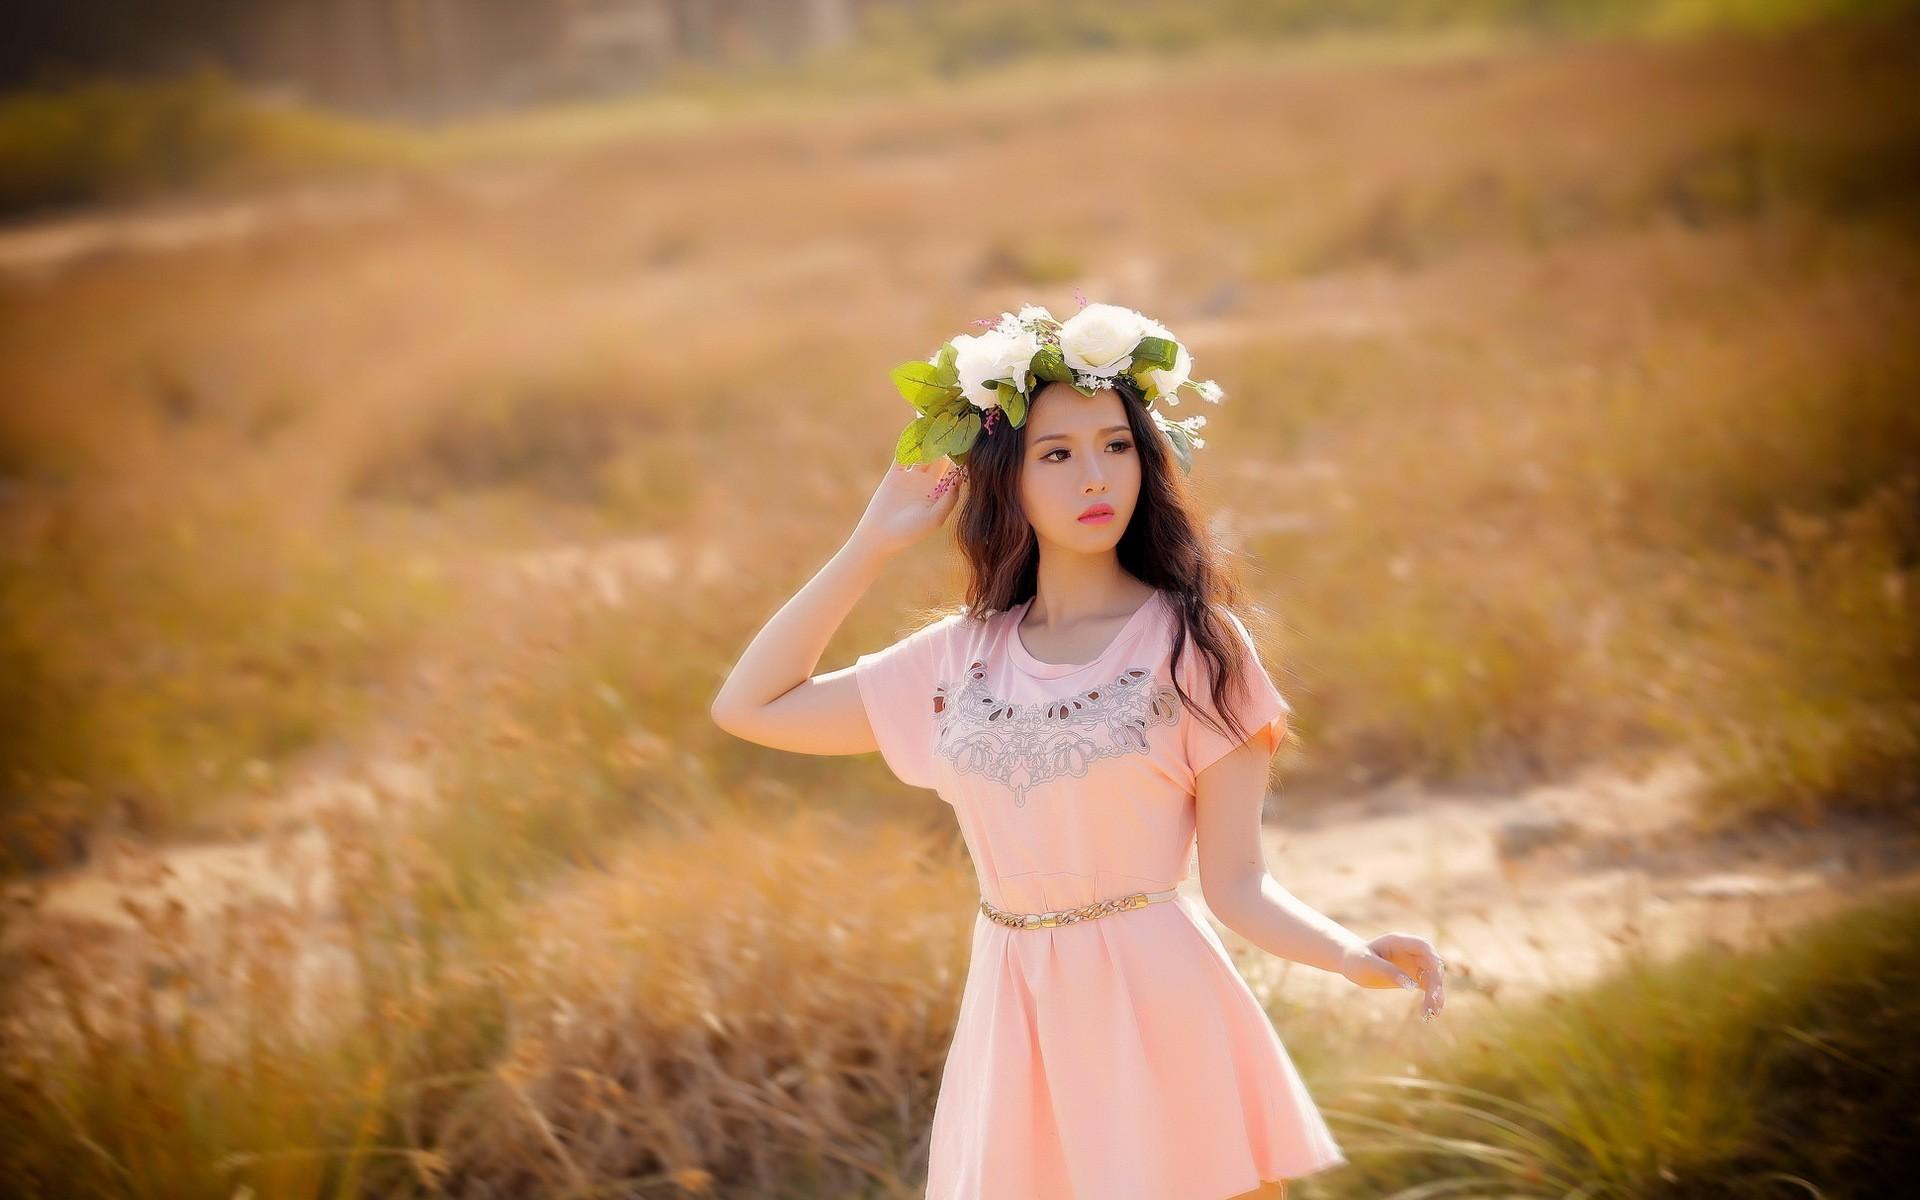 Oriental Beauty Girls Wallpaper Desktop Picture #t1uuhg px 301.72  KB Girls Photography Oriental Beauty